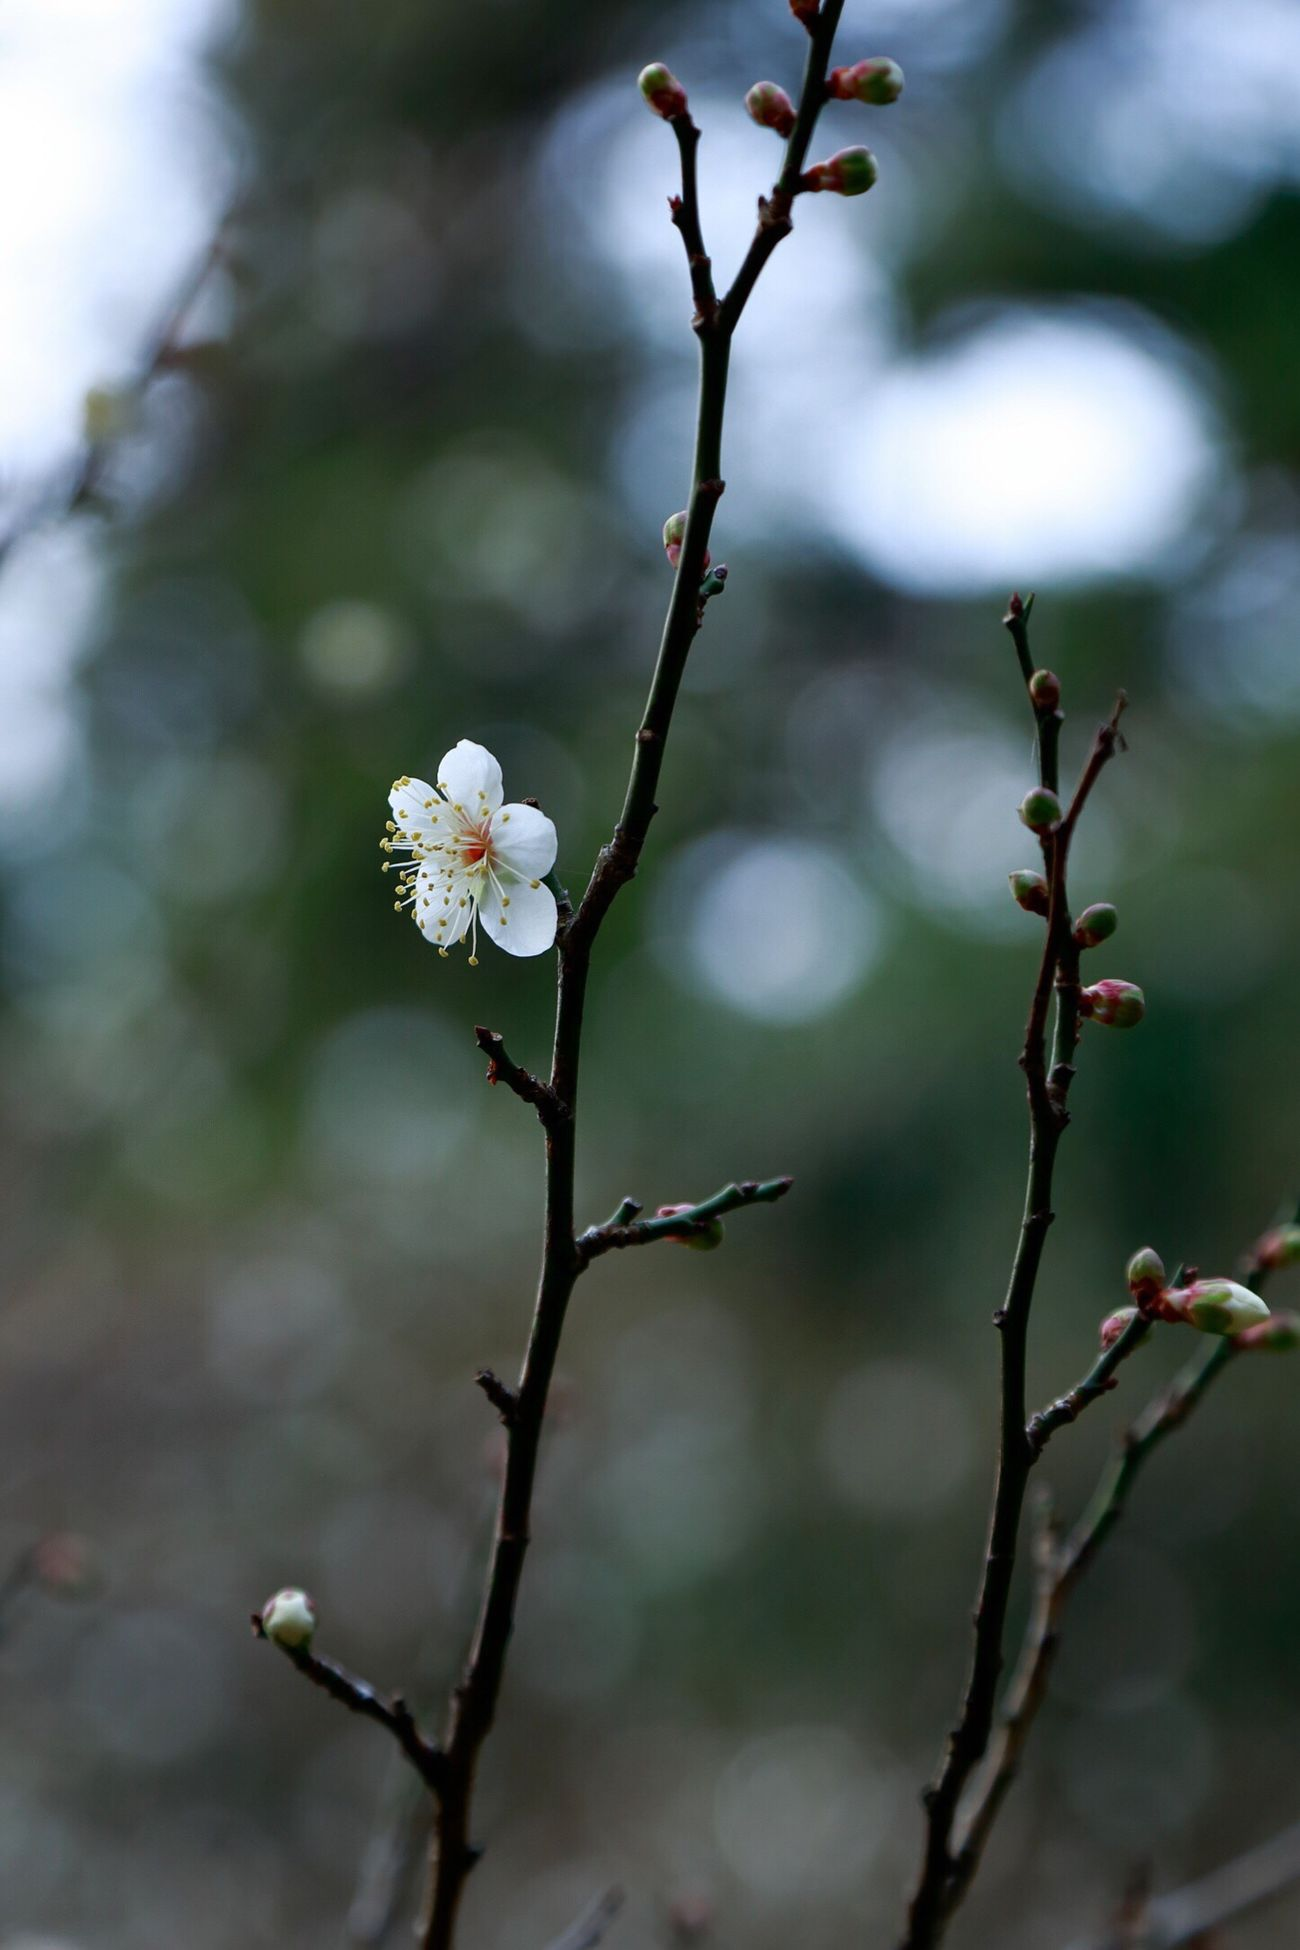 Japanese plum bloomed bit earlier. Maybe, can't wait for spring!!🌸 Japaneseplum Ume Winterflowers Flower Winter Nature Beauty In Nature Blooming Plum Blossom Nature Photography EyeEm Nature Lover EyeEm Best Shots - Nature Week On Eyeem Fukuoka,Japan